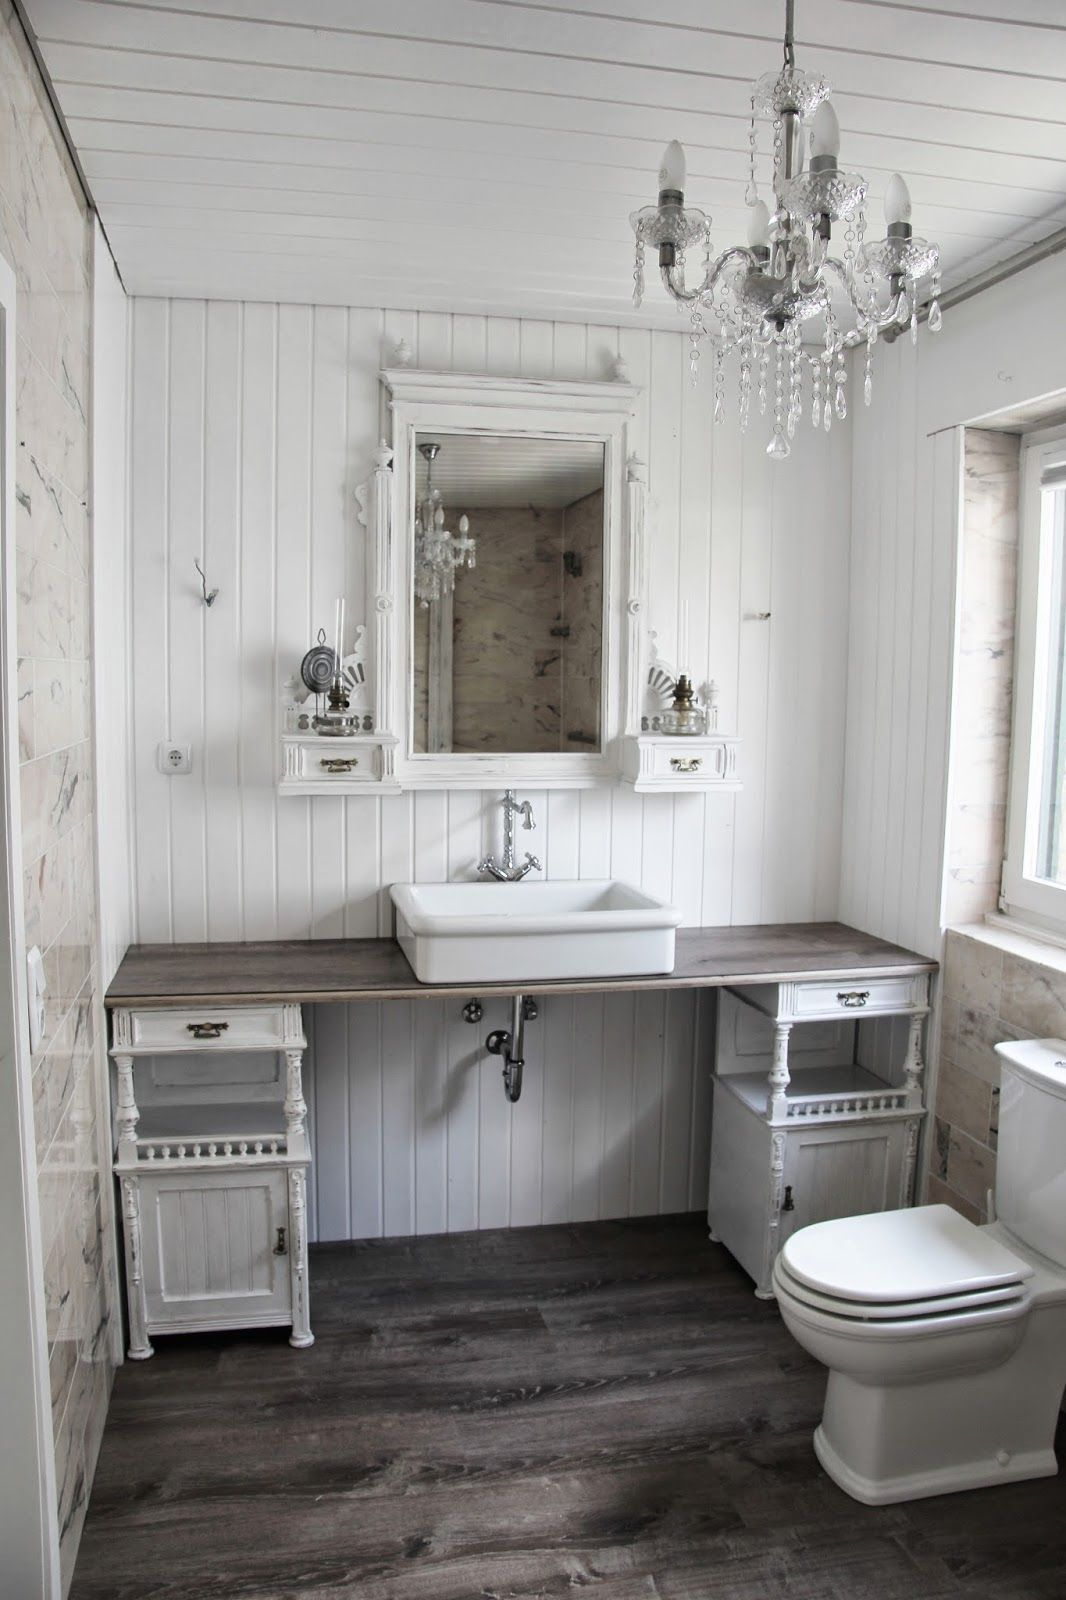 Foto Bagni Stile Country 01.06.2014+001 (1066×1600) | shabby chic bathroom